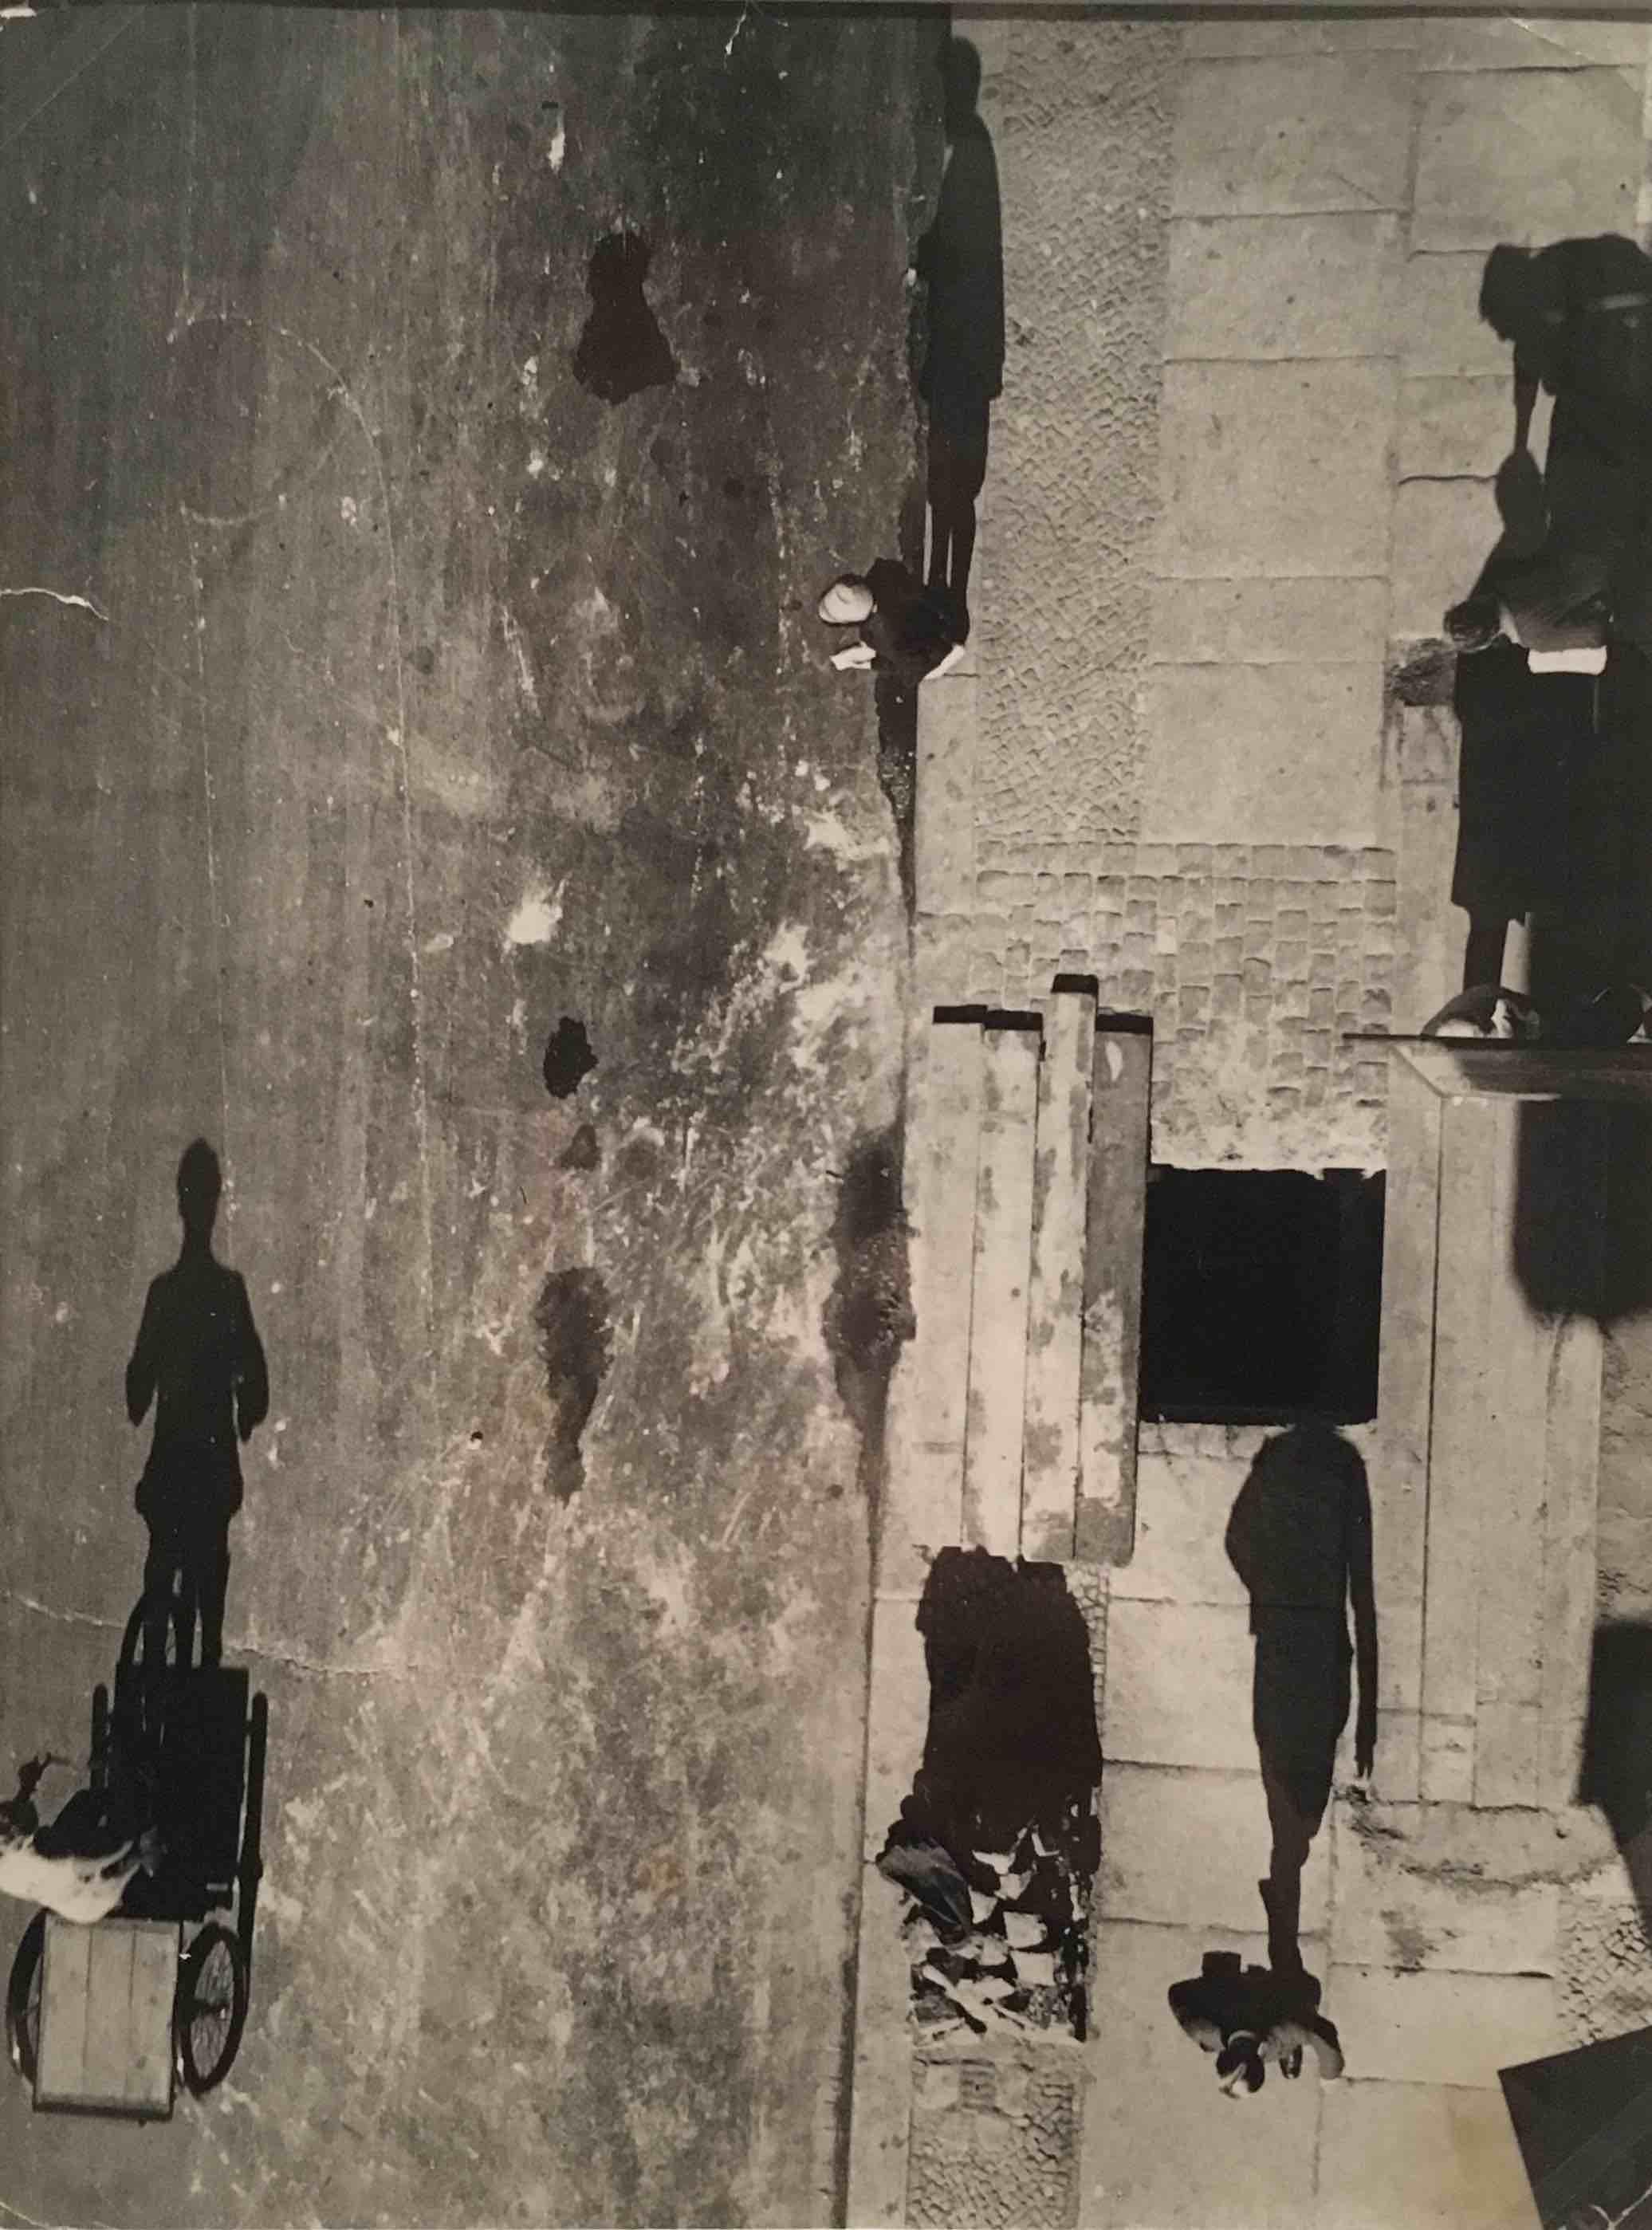 Umbo, Unheimliche Strasse, 1928